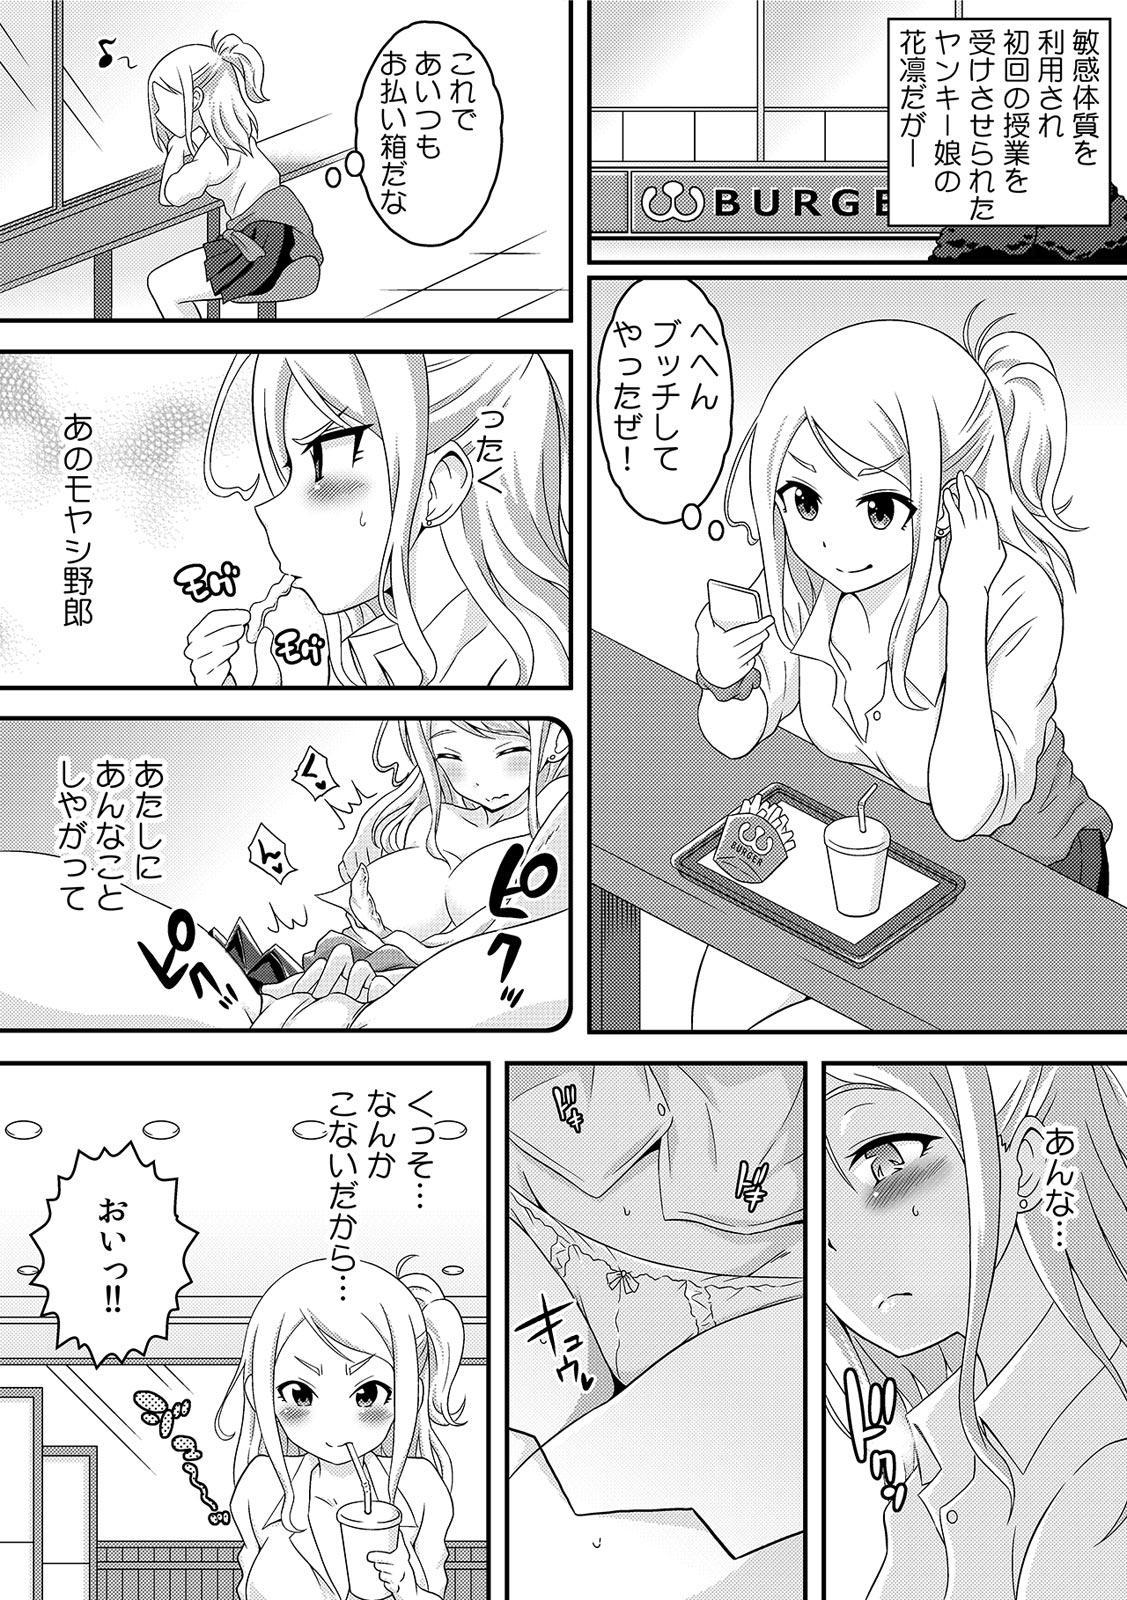 [Yuzu Ramune] Yankee Musume o Ecchi de Kousei!? ~Jugyou de Ijirare Shitagi ga Gusshori~ 1 18